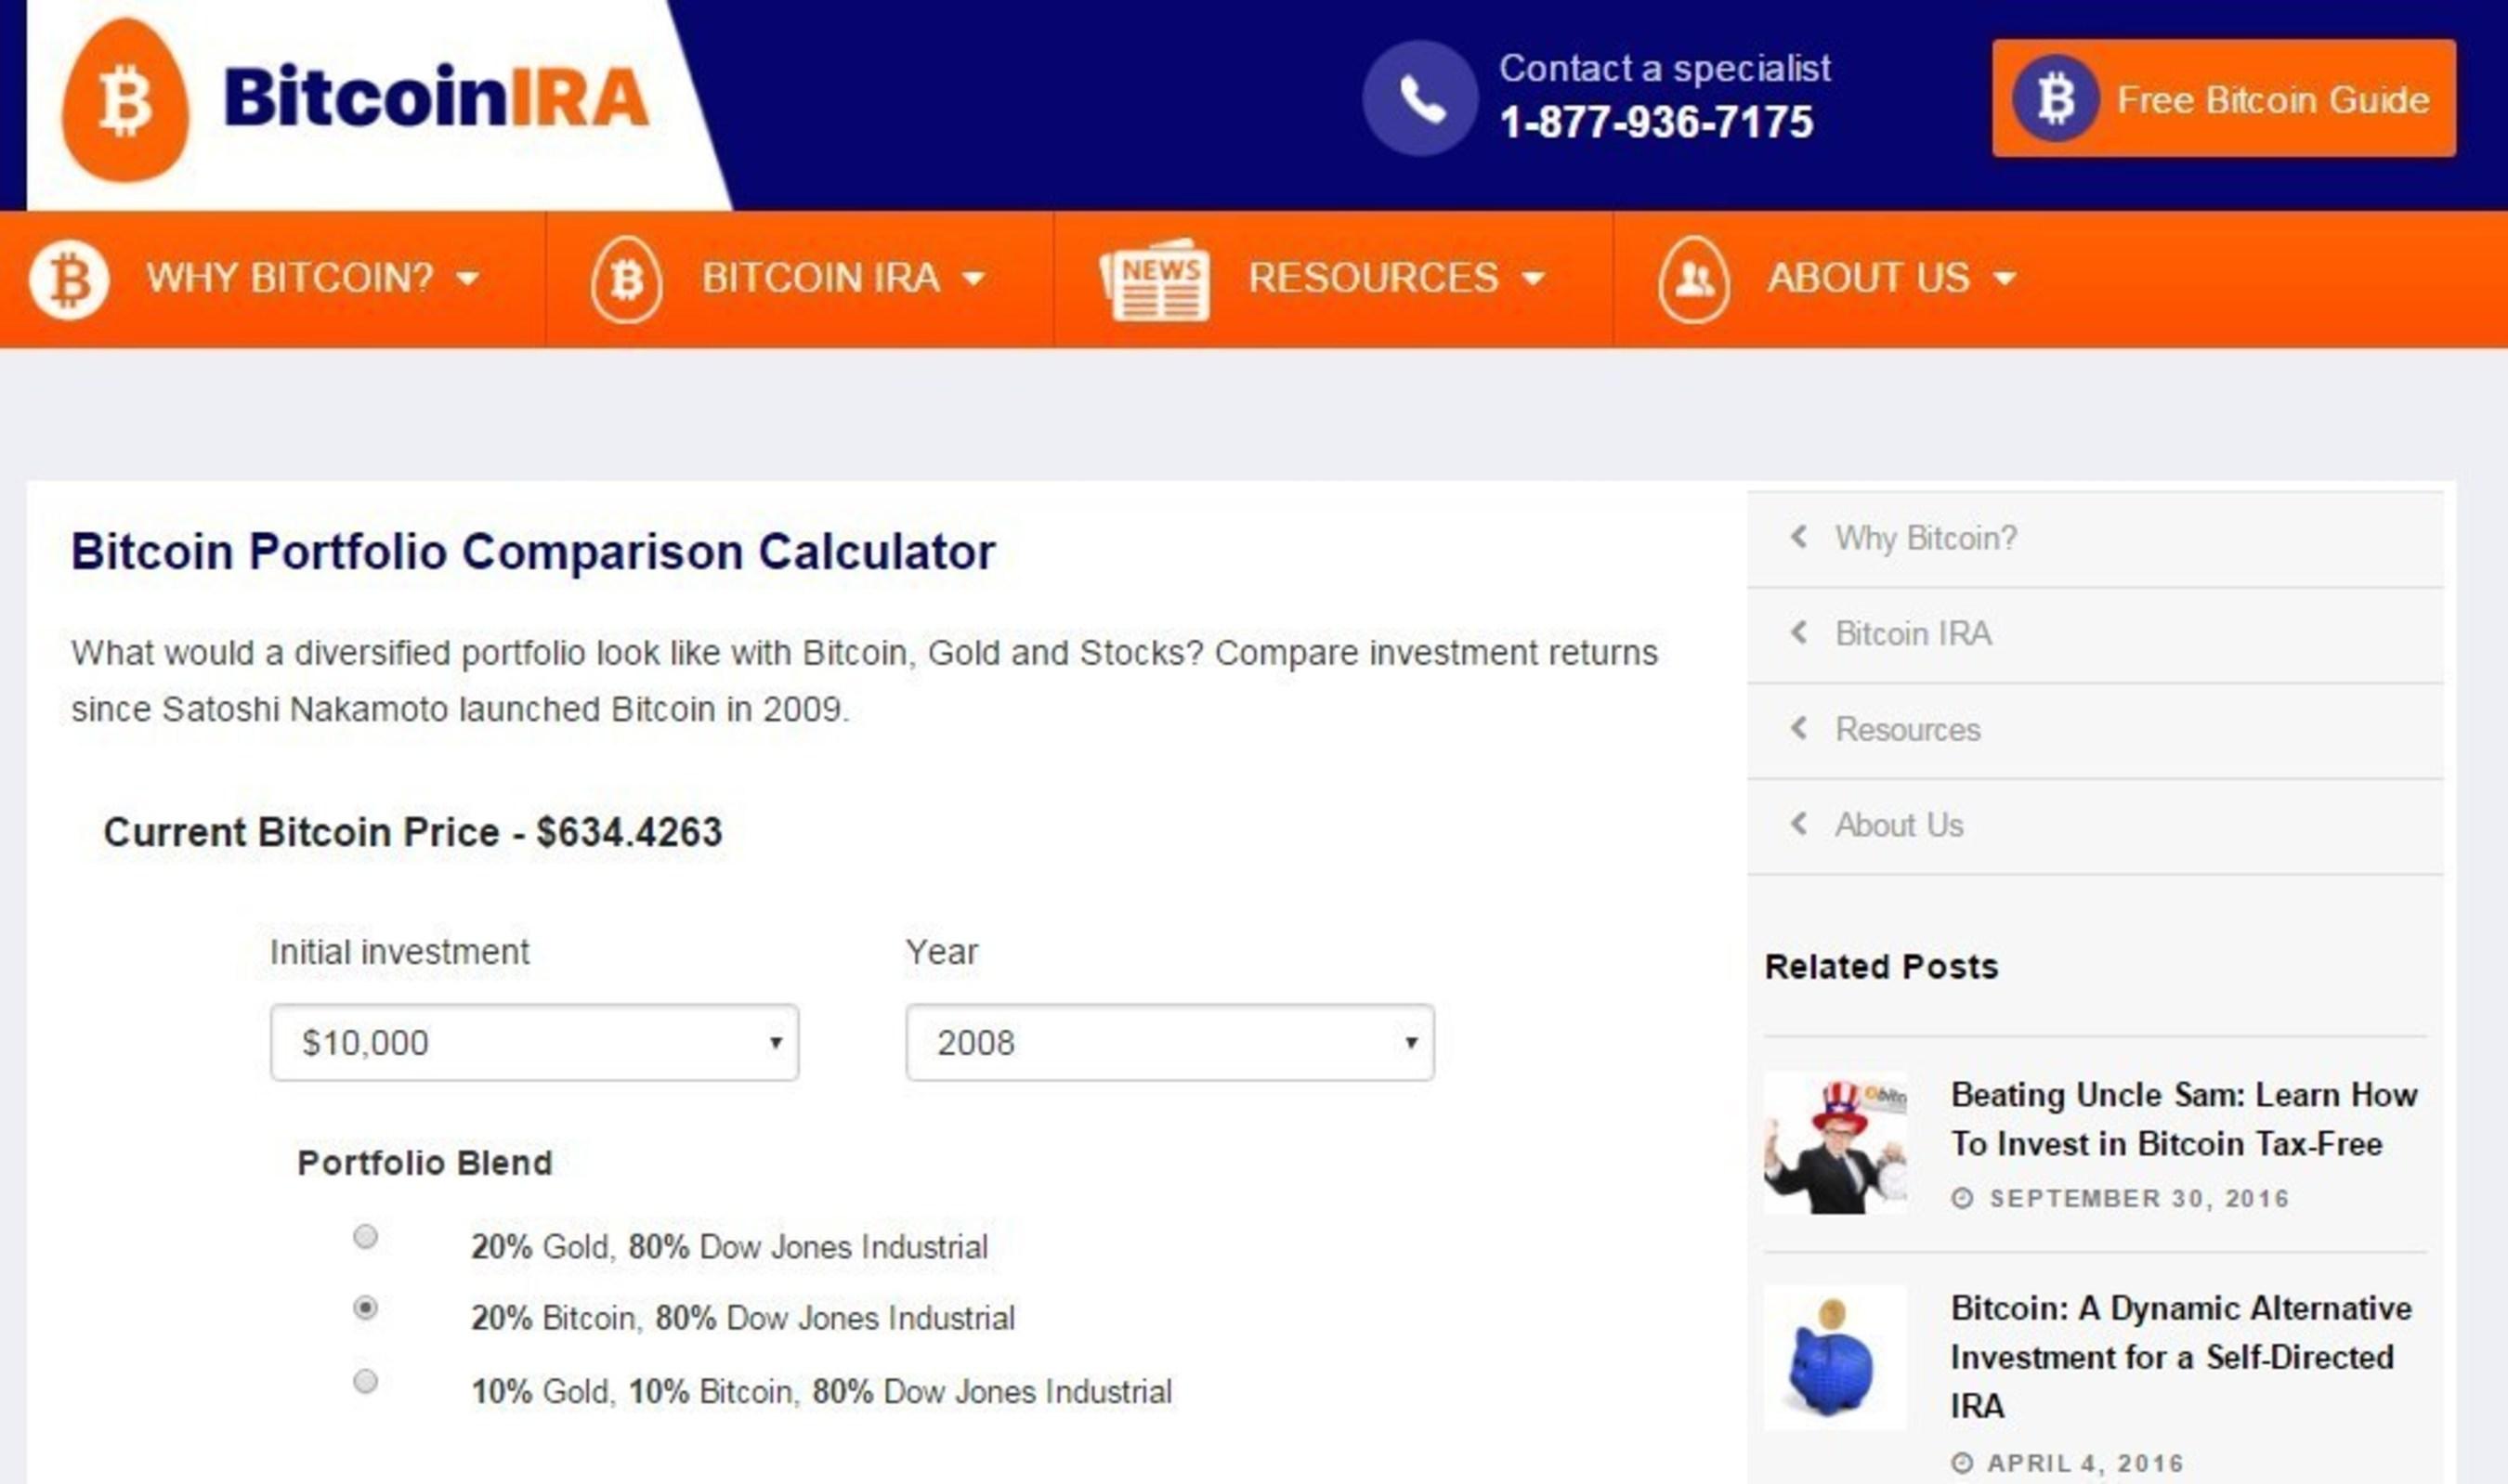 Bitcoin IRA Launches New IRA Calculator Tool for Investors